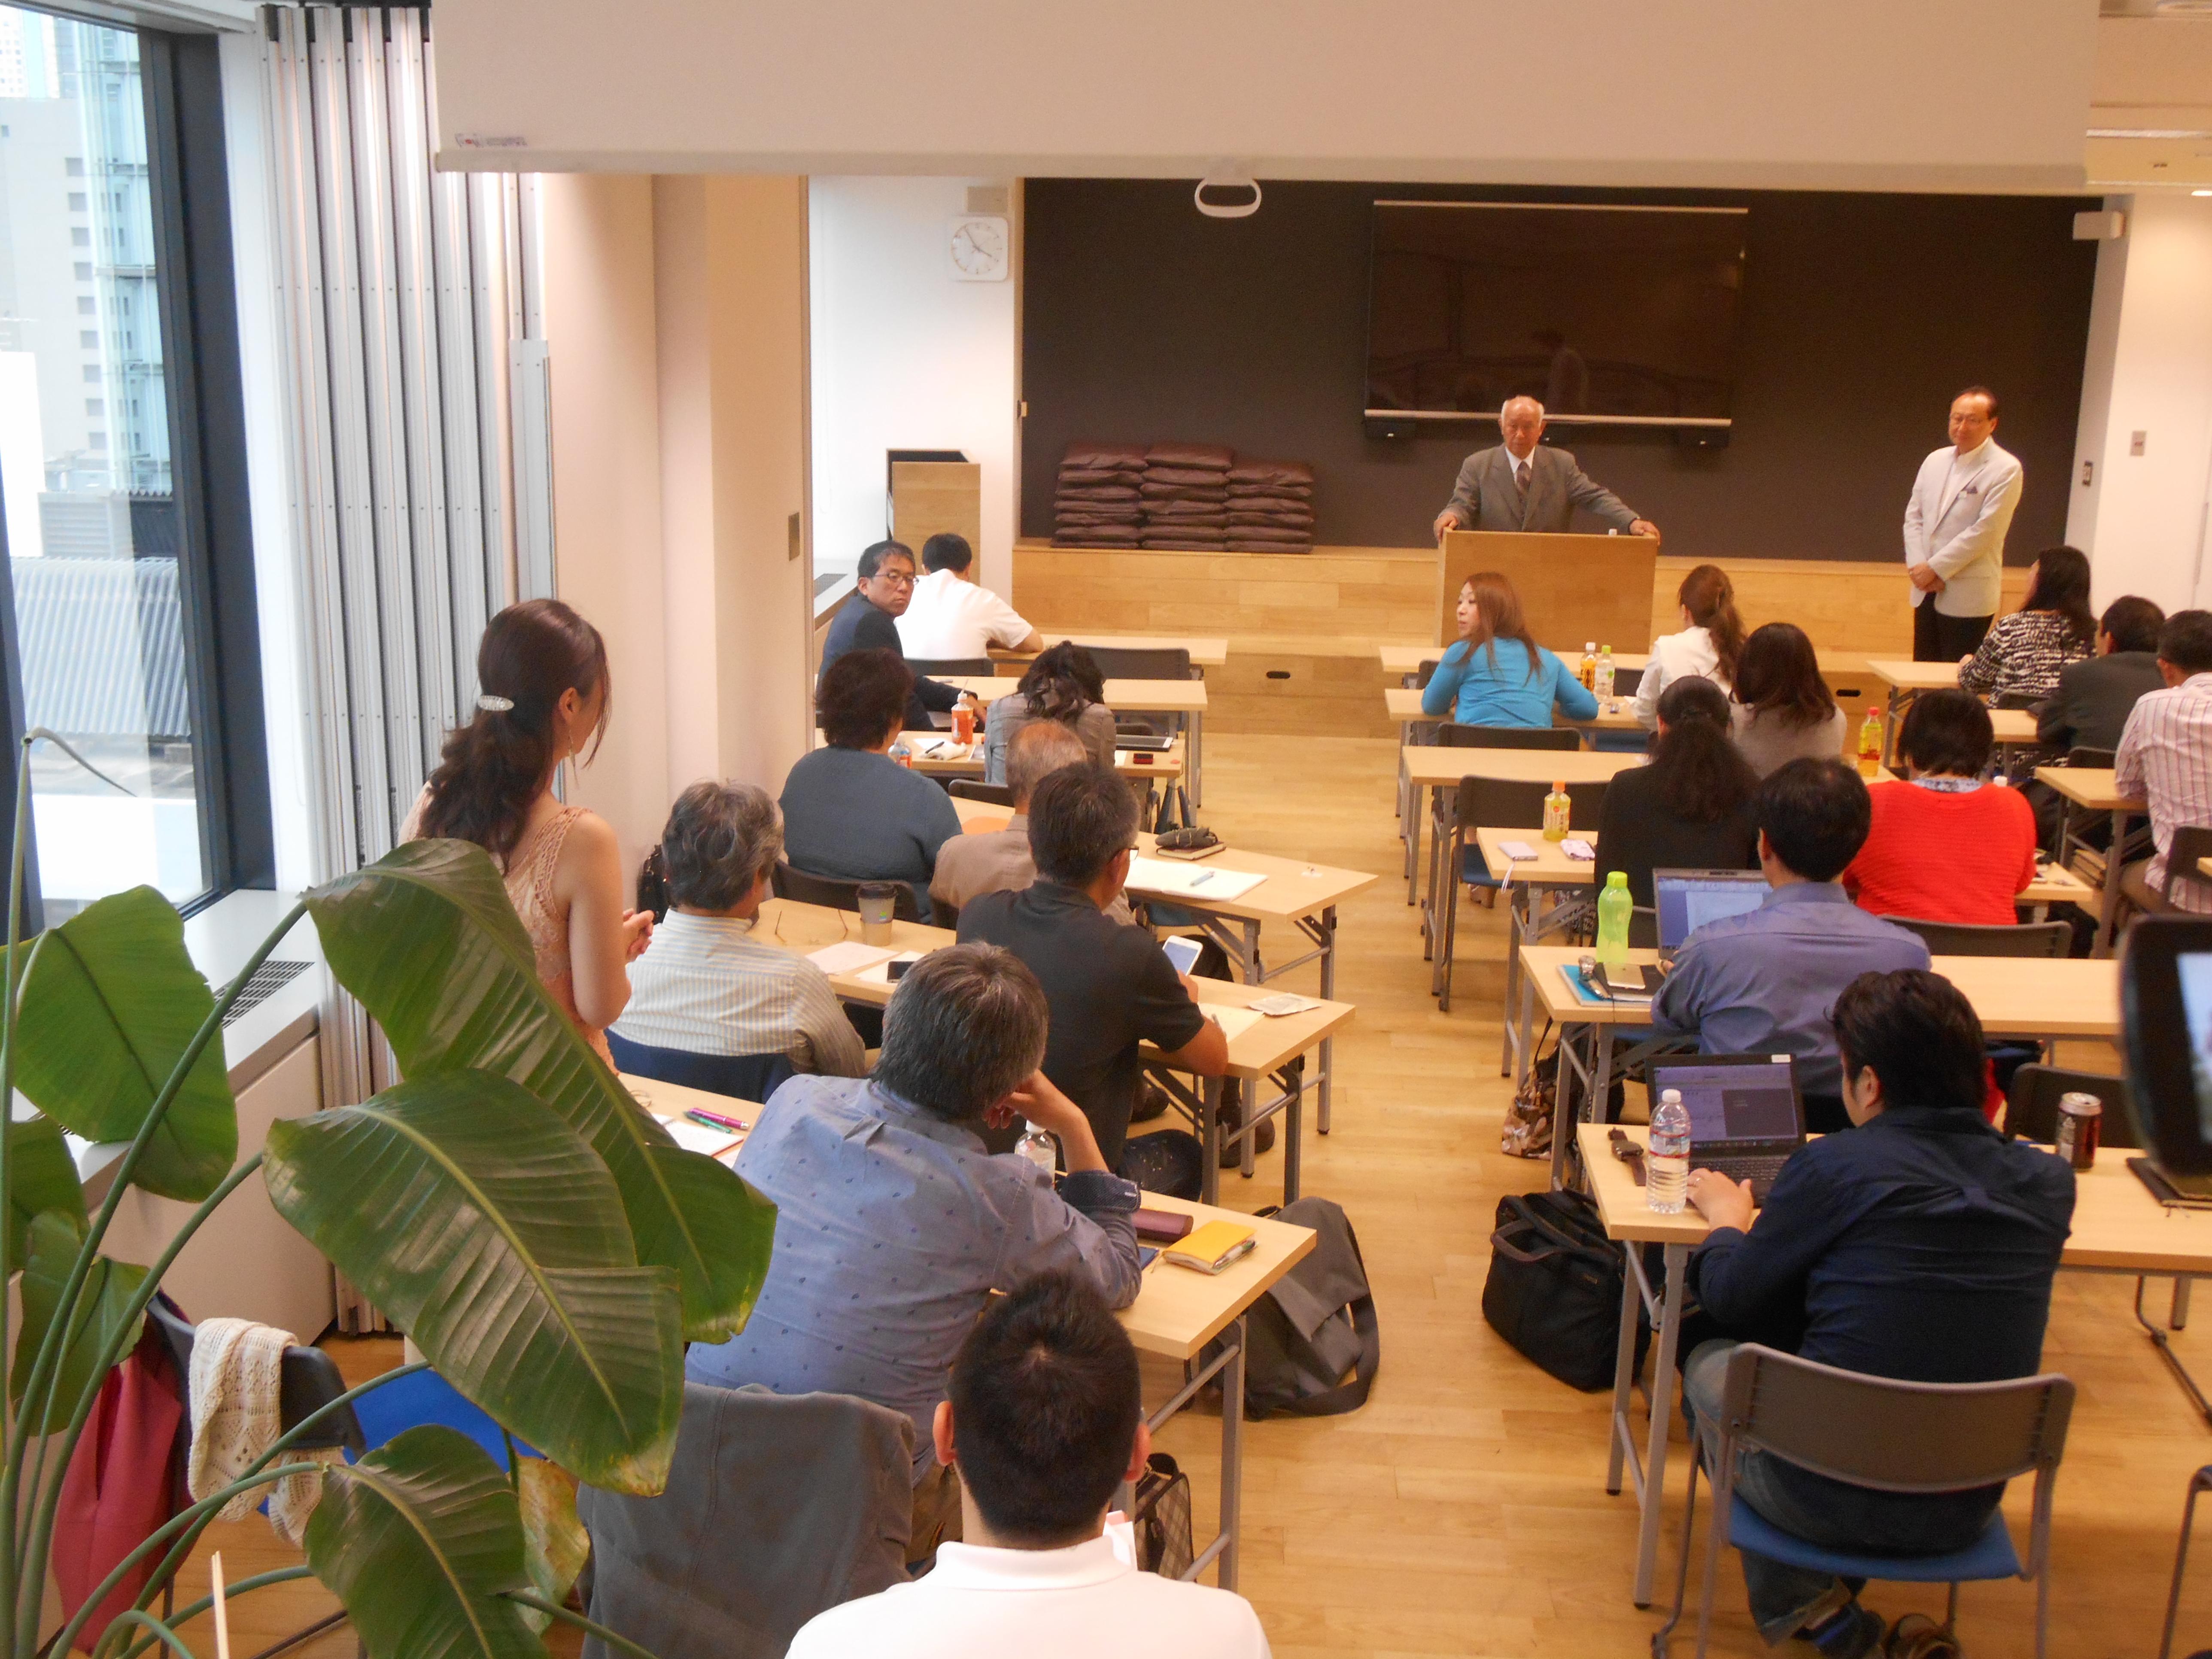 DSCN1701 - 4月1日東京思風塾の開催になります。